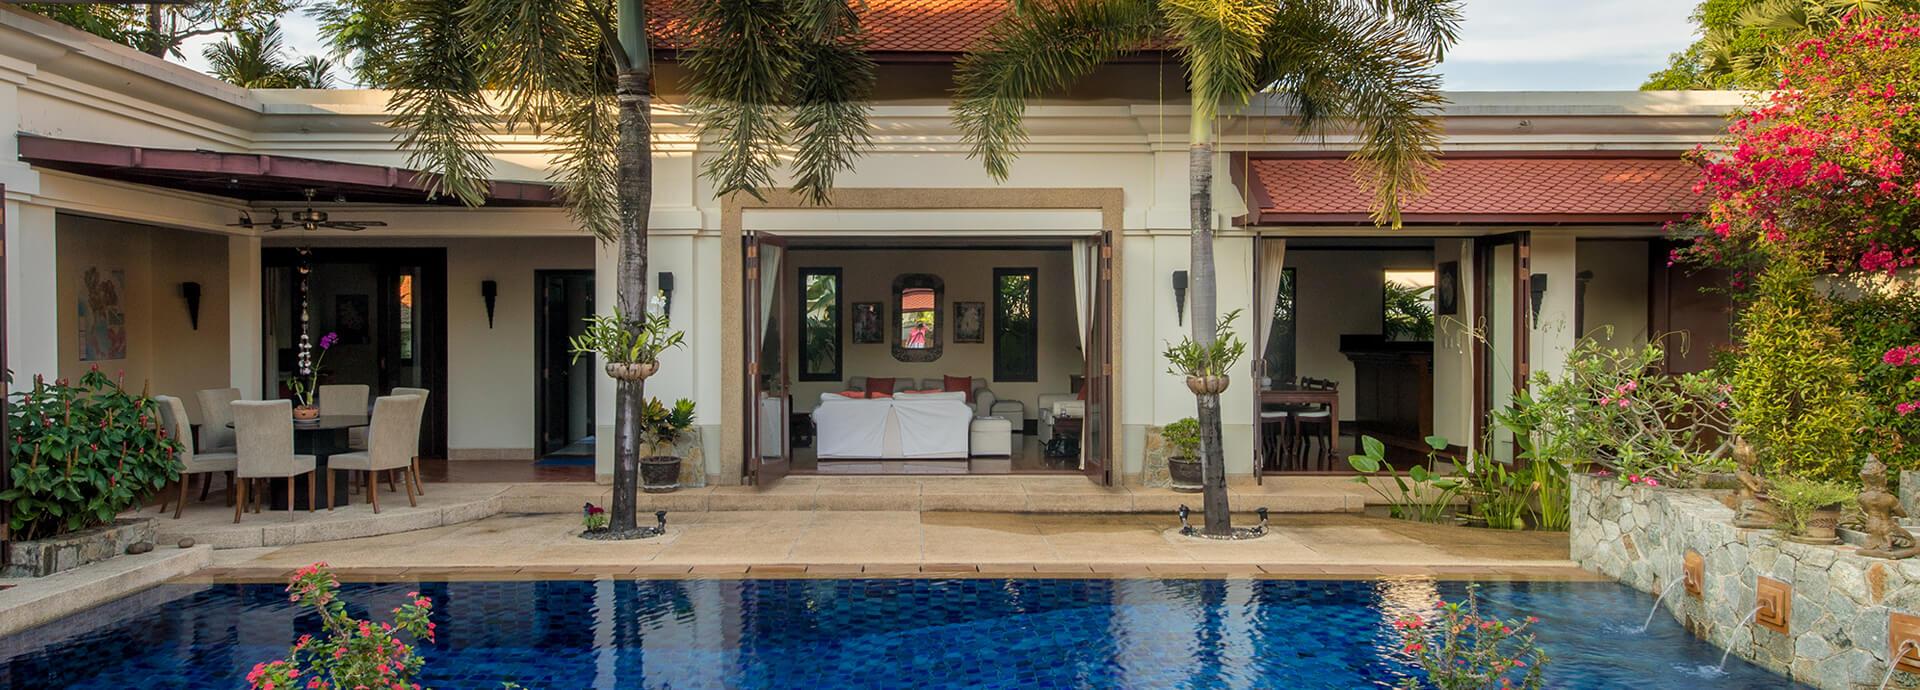 Sai Taan 4 Bed Luxury Villa - 1596-banner-prime.jpg